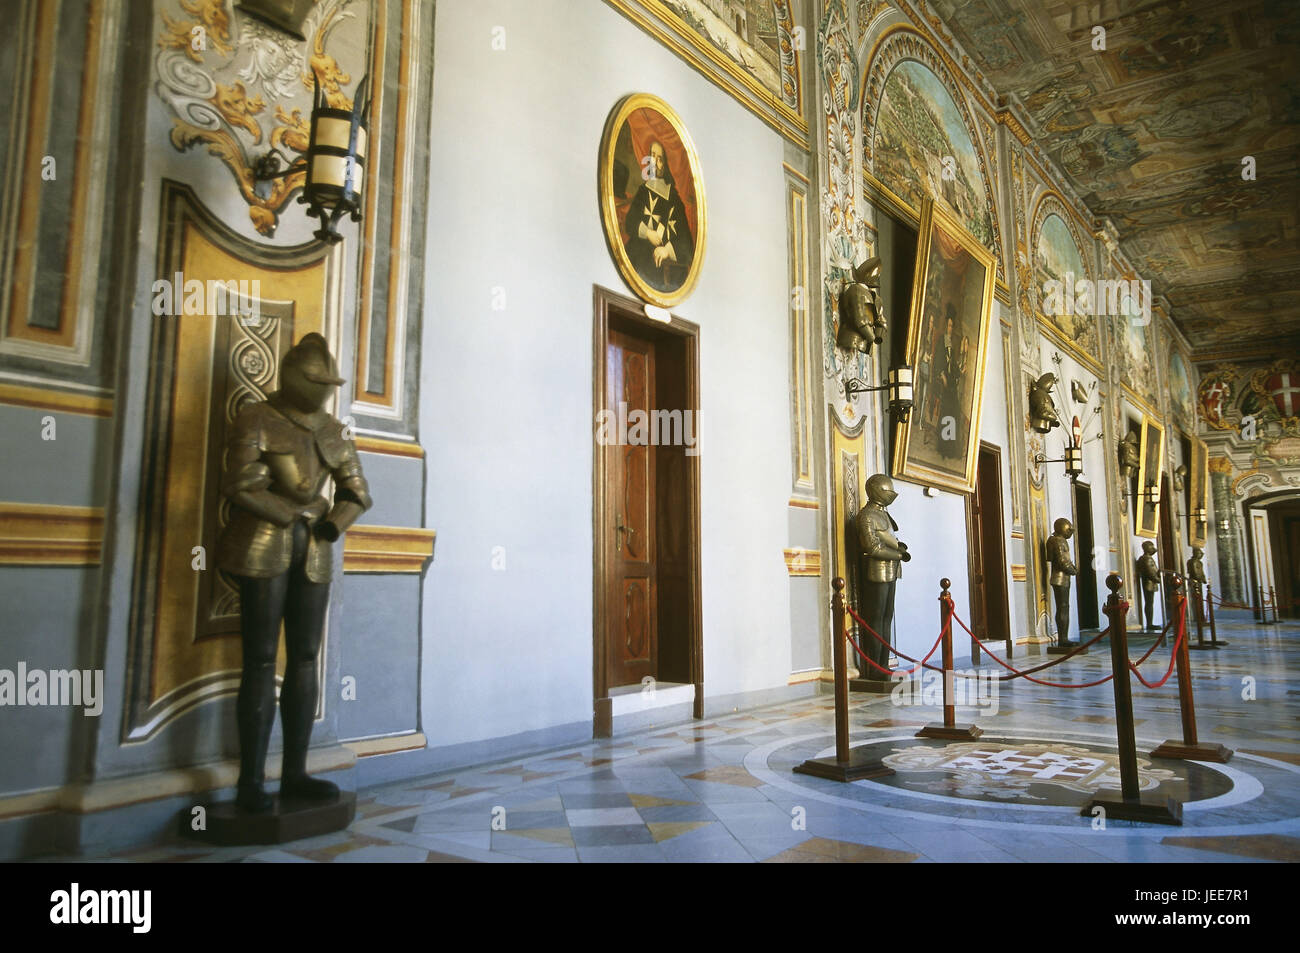 Island Malta, Valletta, Old Town, Grand Master's palace, hall, painting, armaments, Maltese islands, Mediterranean - Stock Image